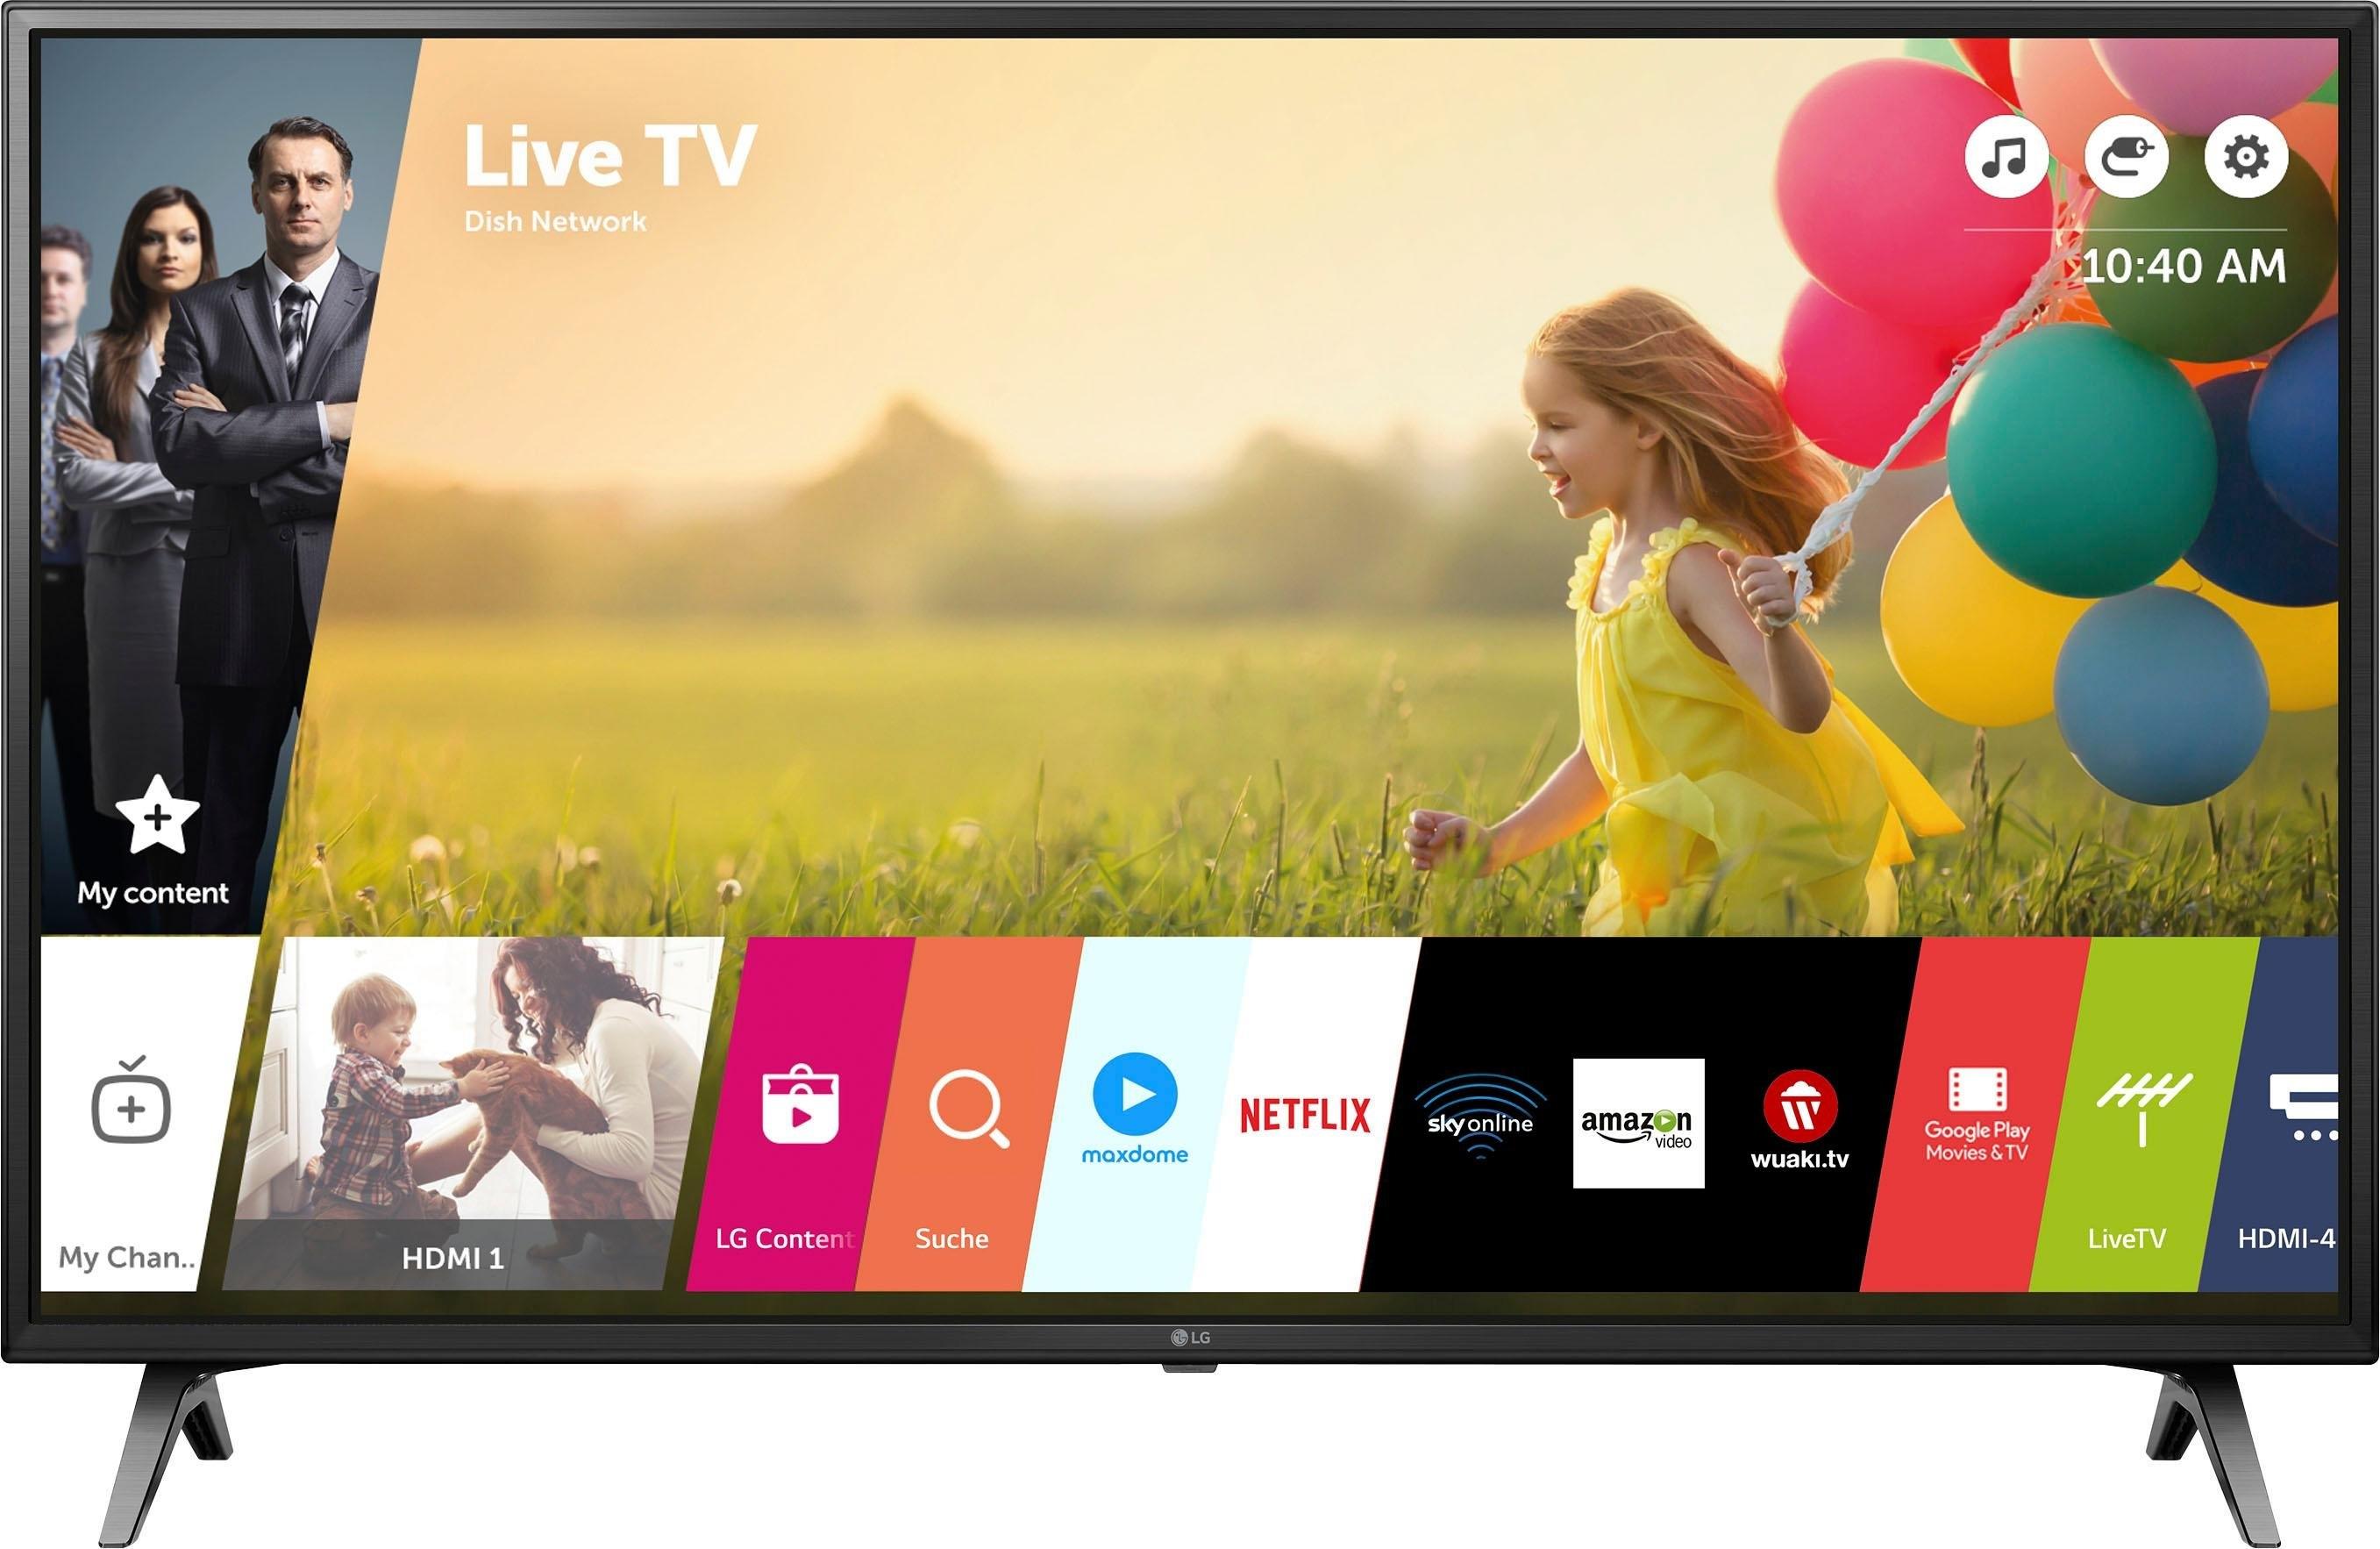 LG 55UM7000PLC led-tv (139 cm / 55 inch), 4K Ultra HD, smart-tv voordelig en veilig online kopen